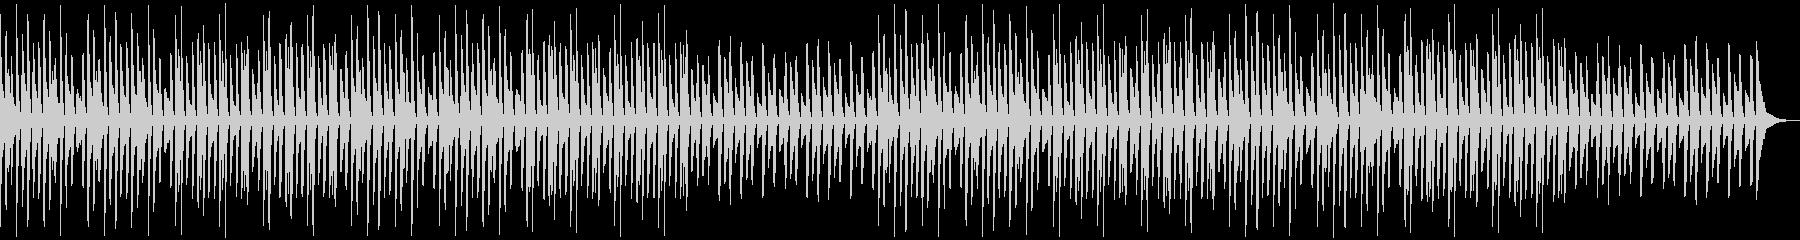 YouTube・ほのぼのピアノソロの未再生の波形